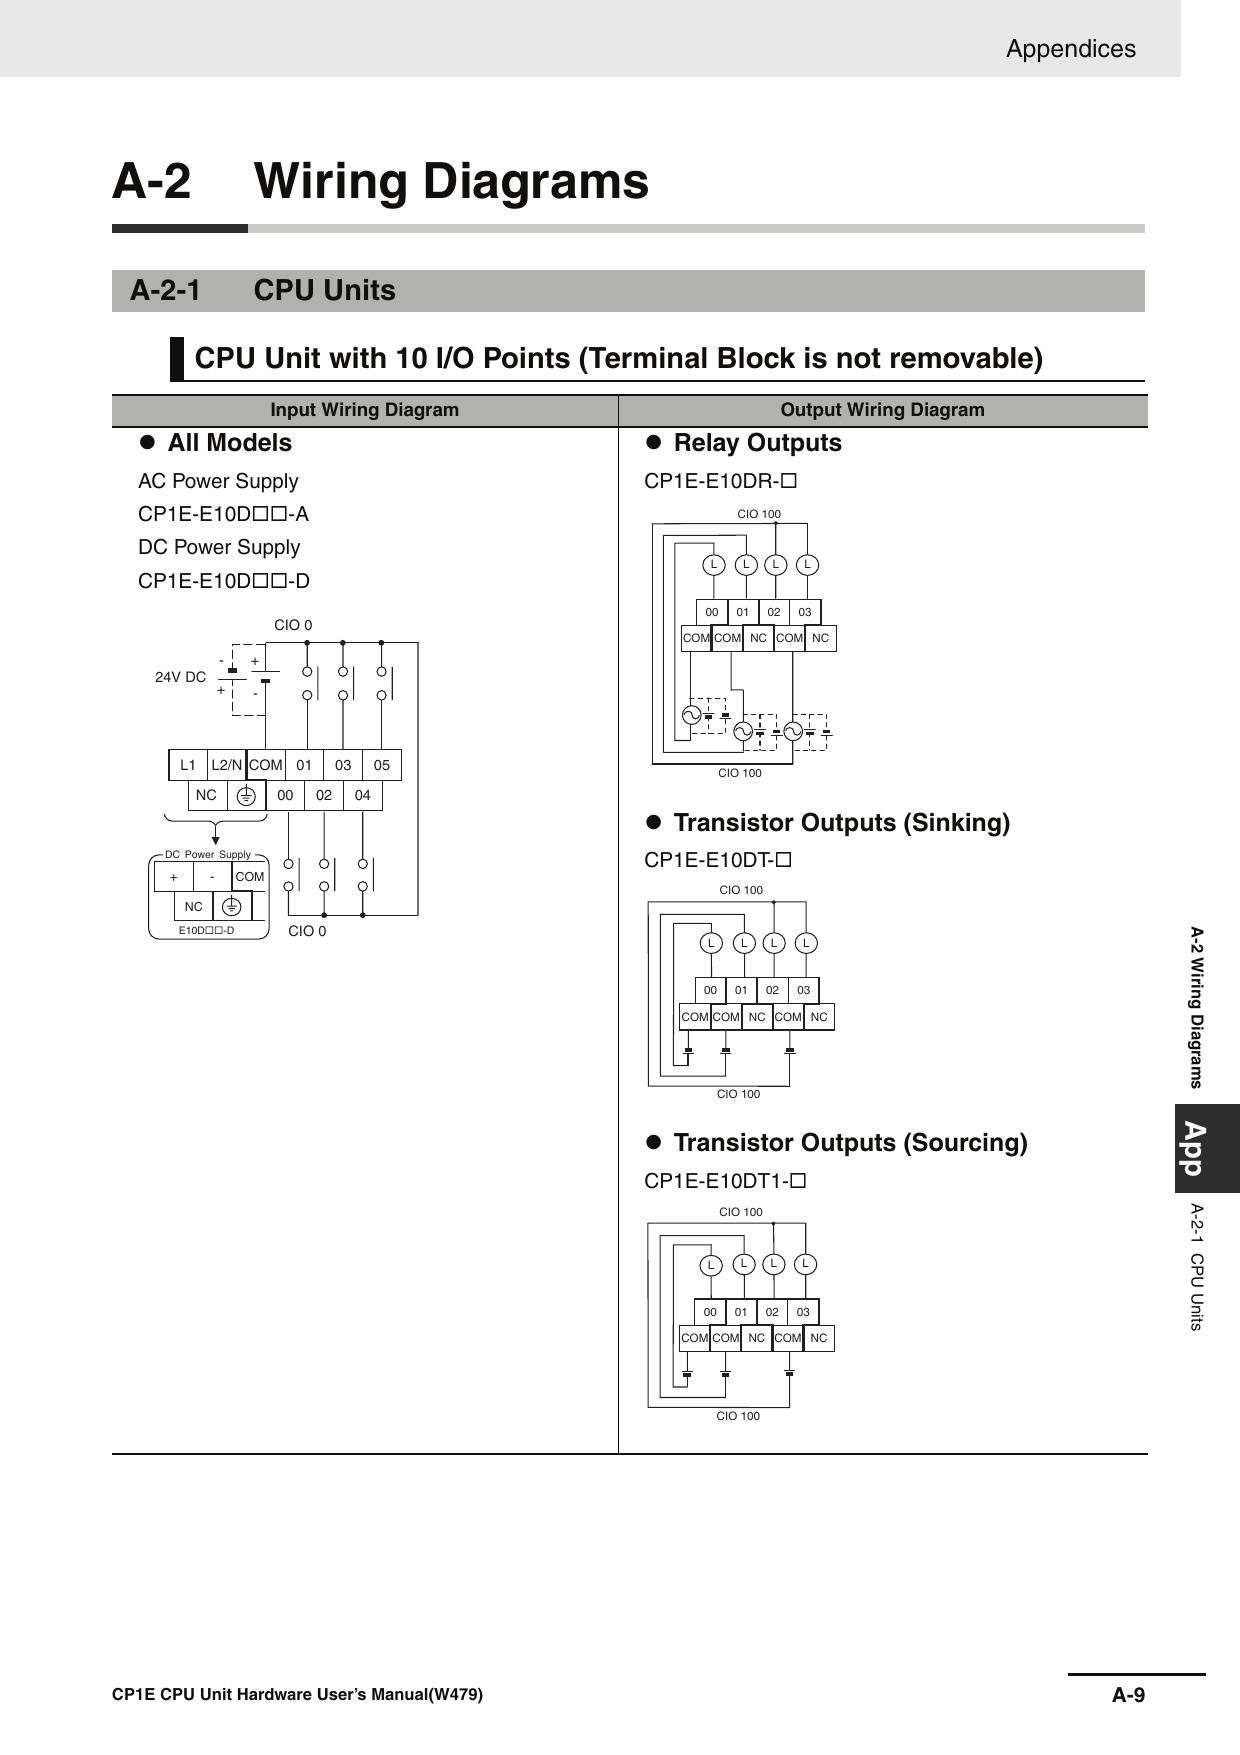 CP1E CPU Unit Hardware - Support | manualzz.com Hardware Wiring Diagram on internet of things diagrams, engine diagrams, series and parallel circuits diagrams, sincgars radio configurations diagrams, electrical diagrams, troubleshooting diagrams, honda motorcycle repair diagrams, lighting diagrams, smart car diagrams, switch diagrams, transformer diagrams, hvac diagrams, led circuit diagrams, electronic circuit diagrams, pinout diagrams, friendship bracelet diagrams, gmc fuse box diagrams, battery diagrams, motor diagrams,